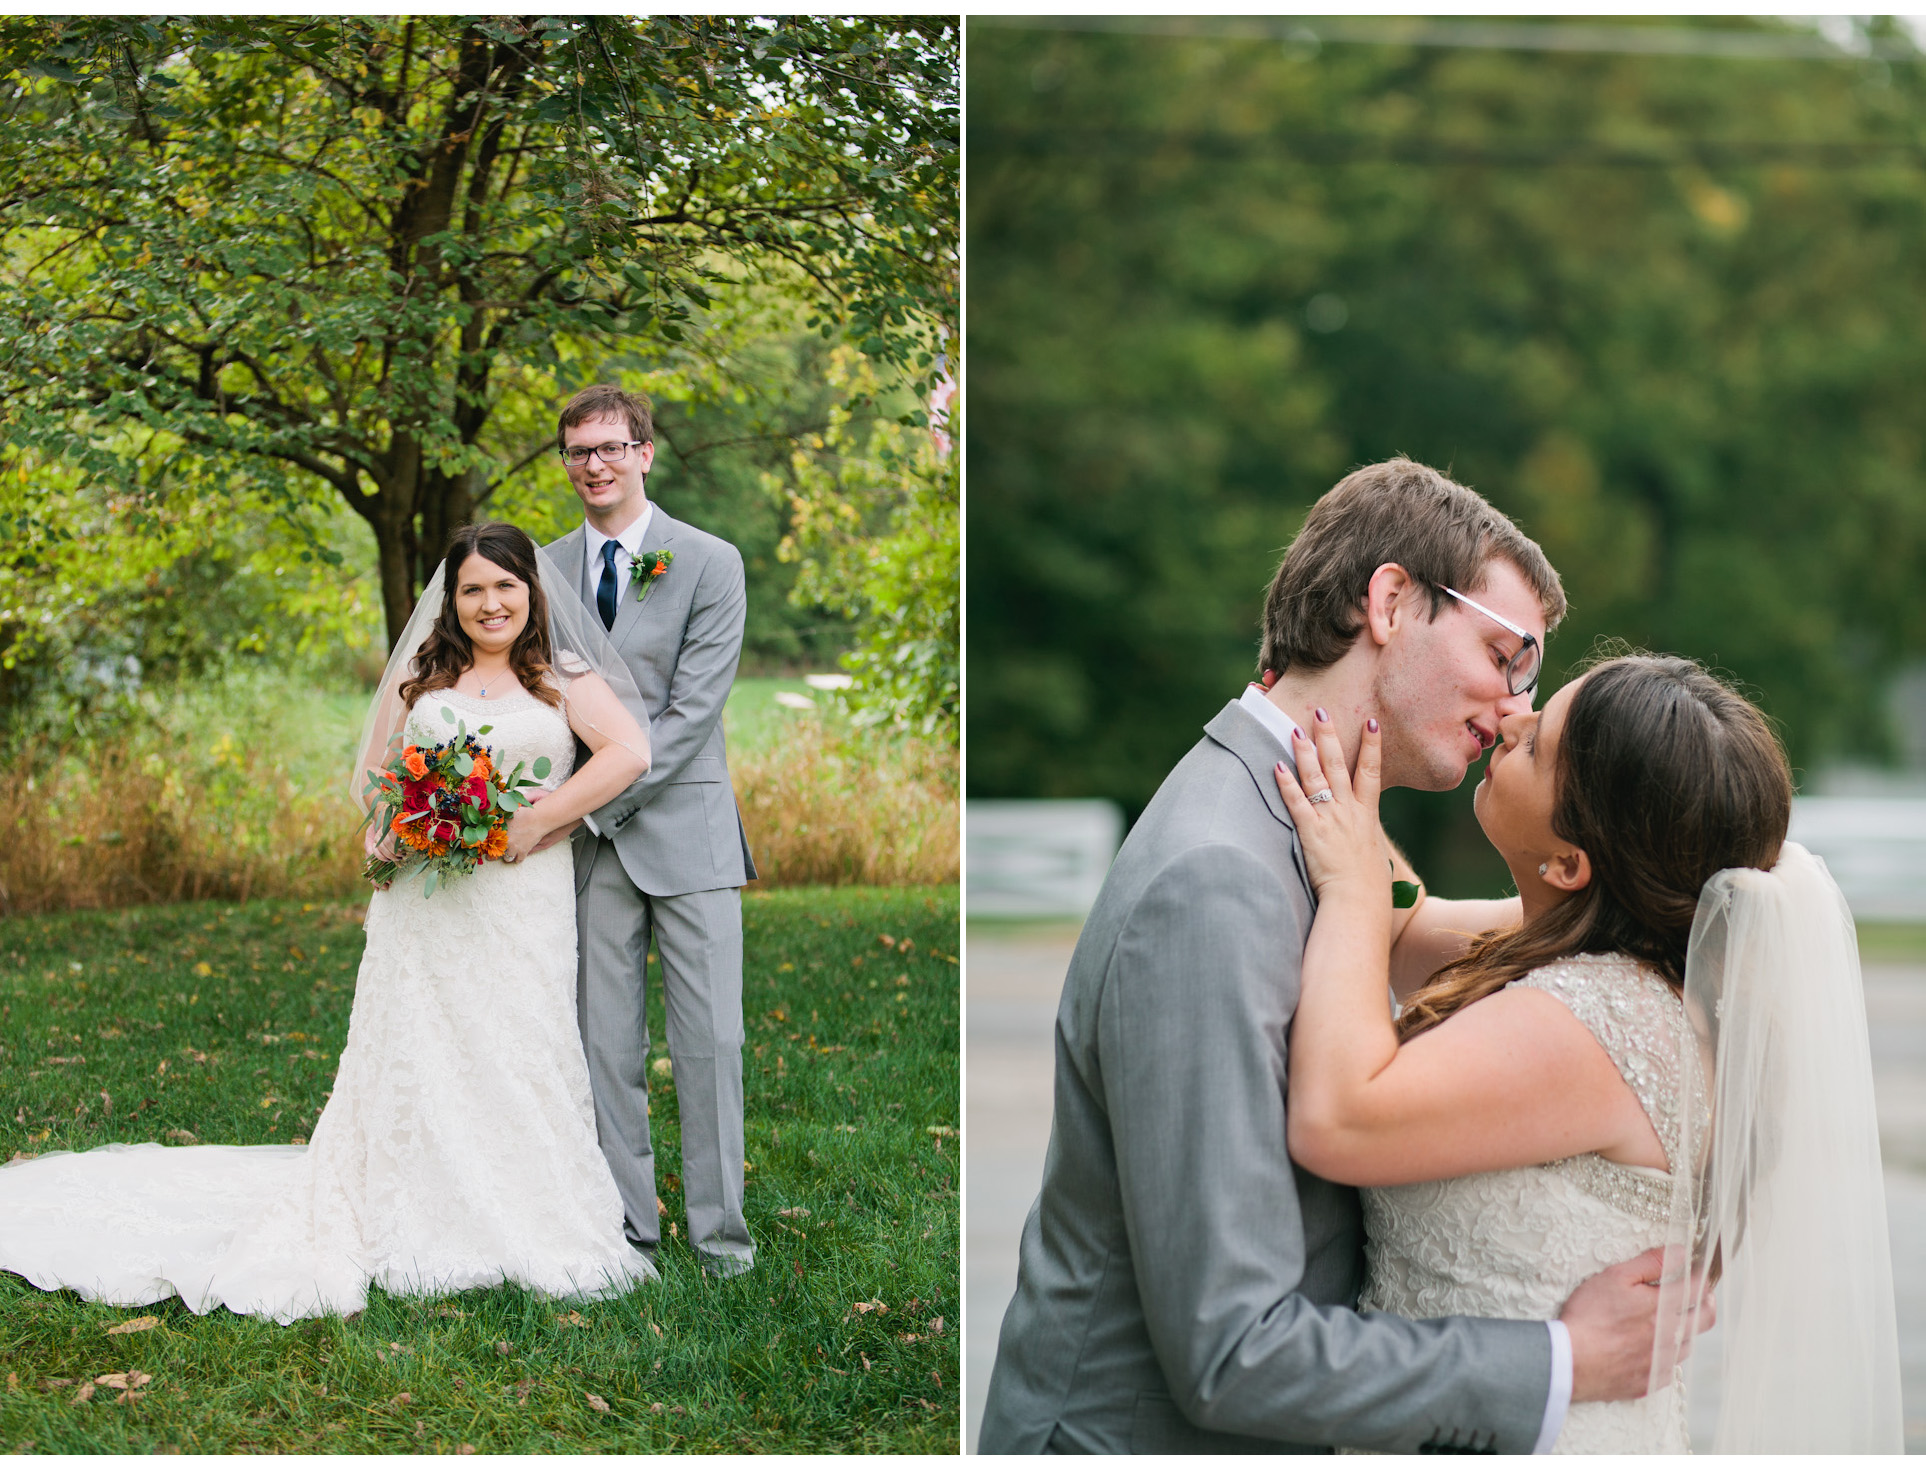 amelia renee photography des moines wedding photographer